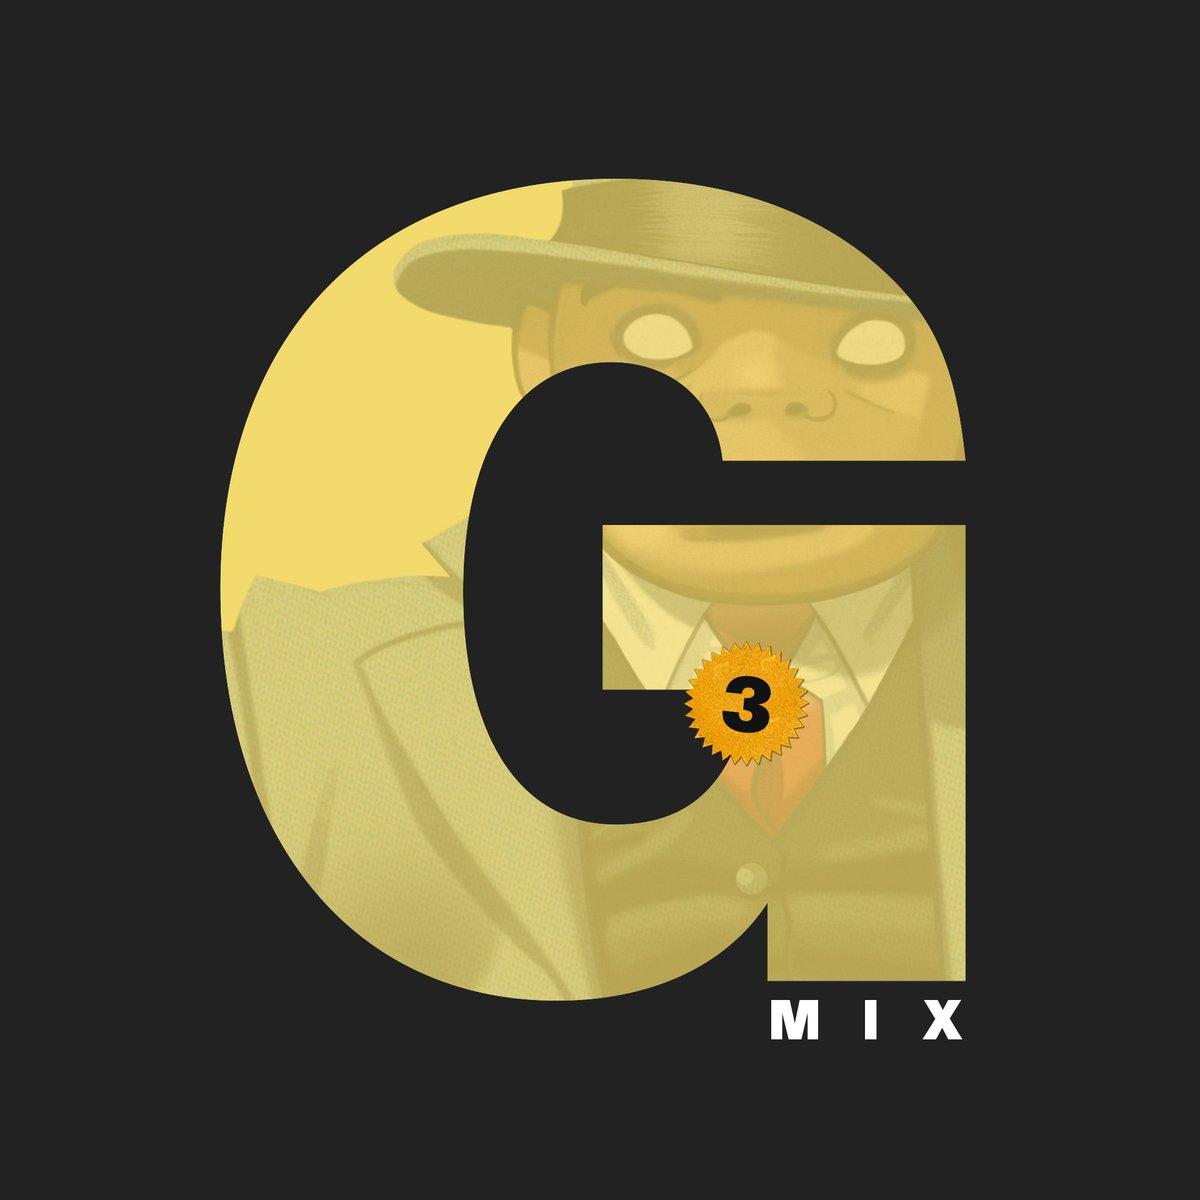 G-Mix: Russel 3